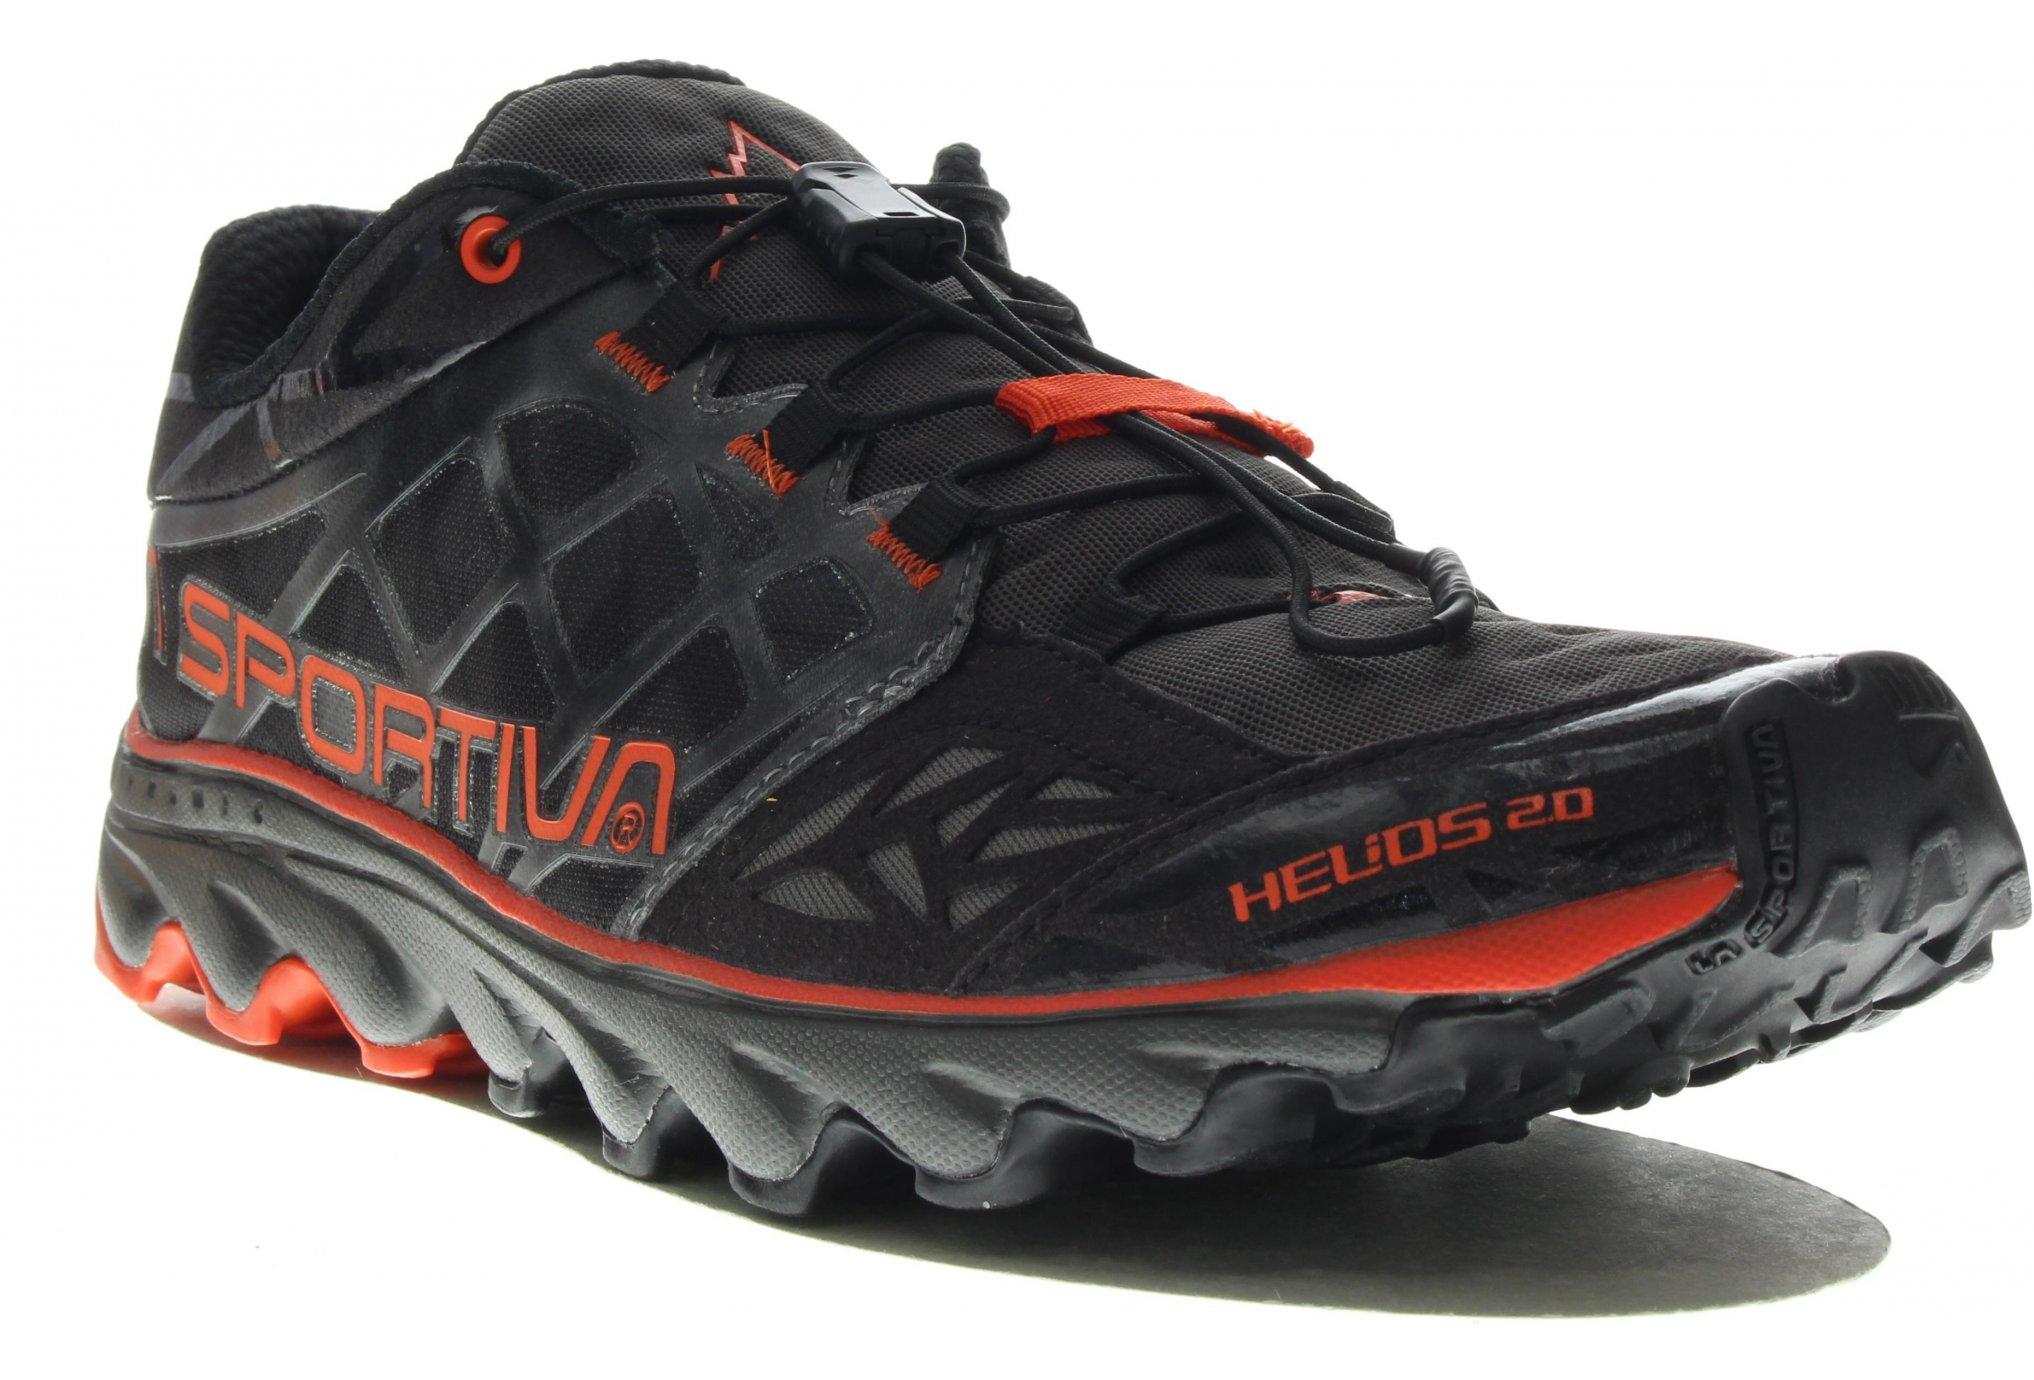 La Sportiva Helios 2.0 déstockage running